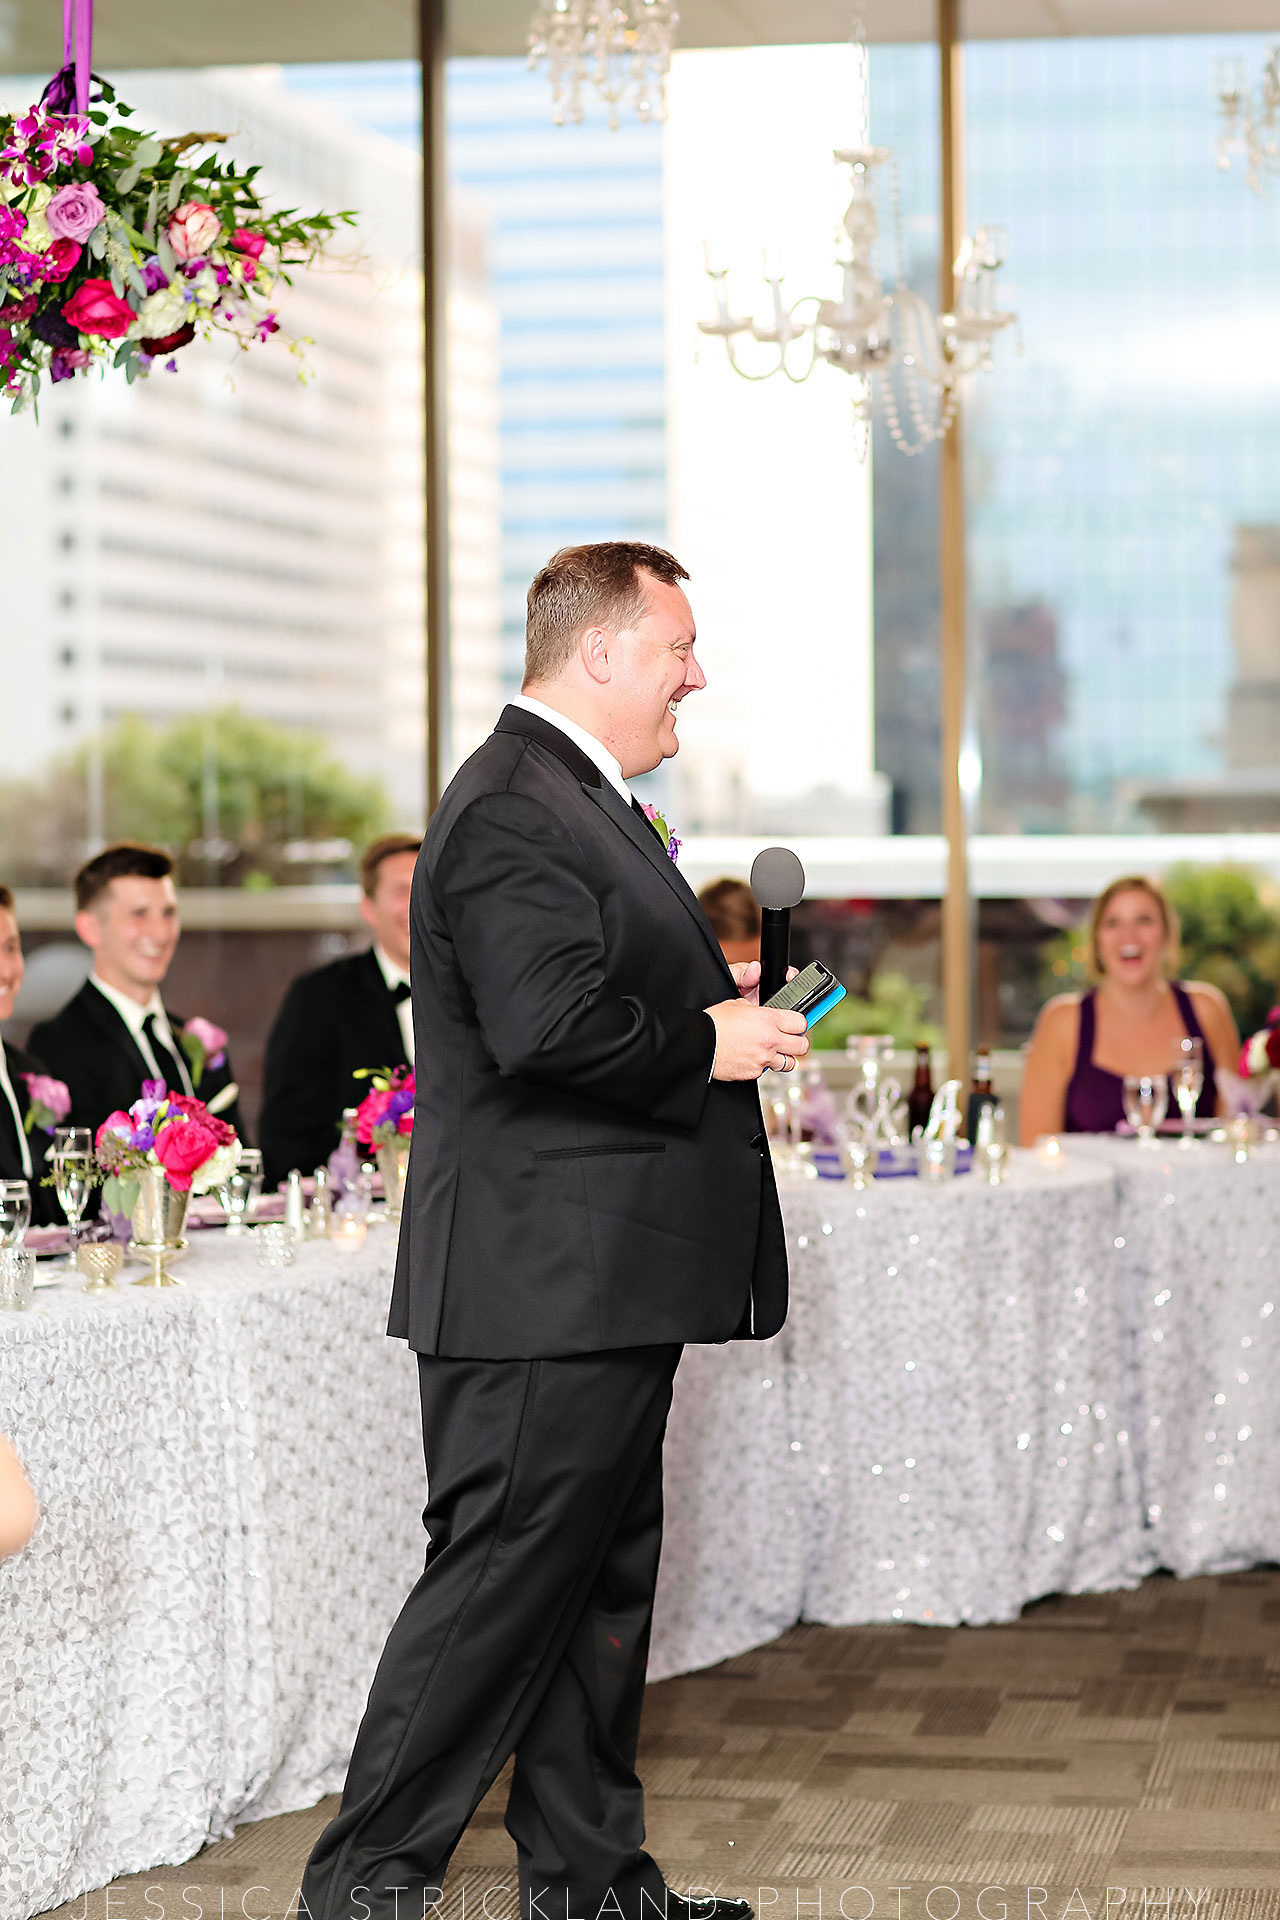 Serra Alex Regions Tower Indianapolis Wedding 309 watermarked